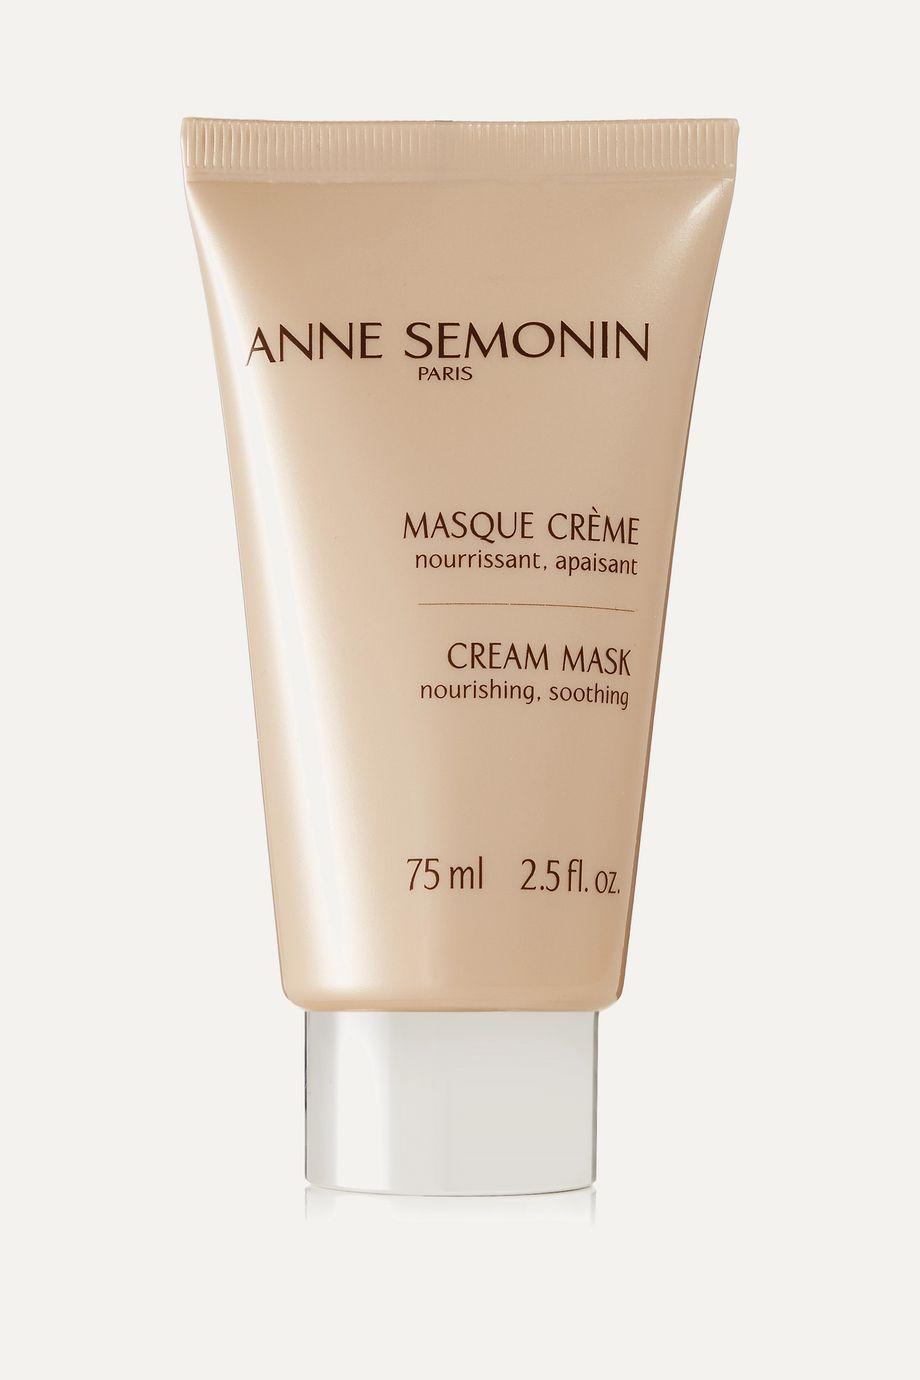 Anne Semonin Cream Mask, 75ml